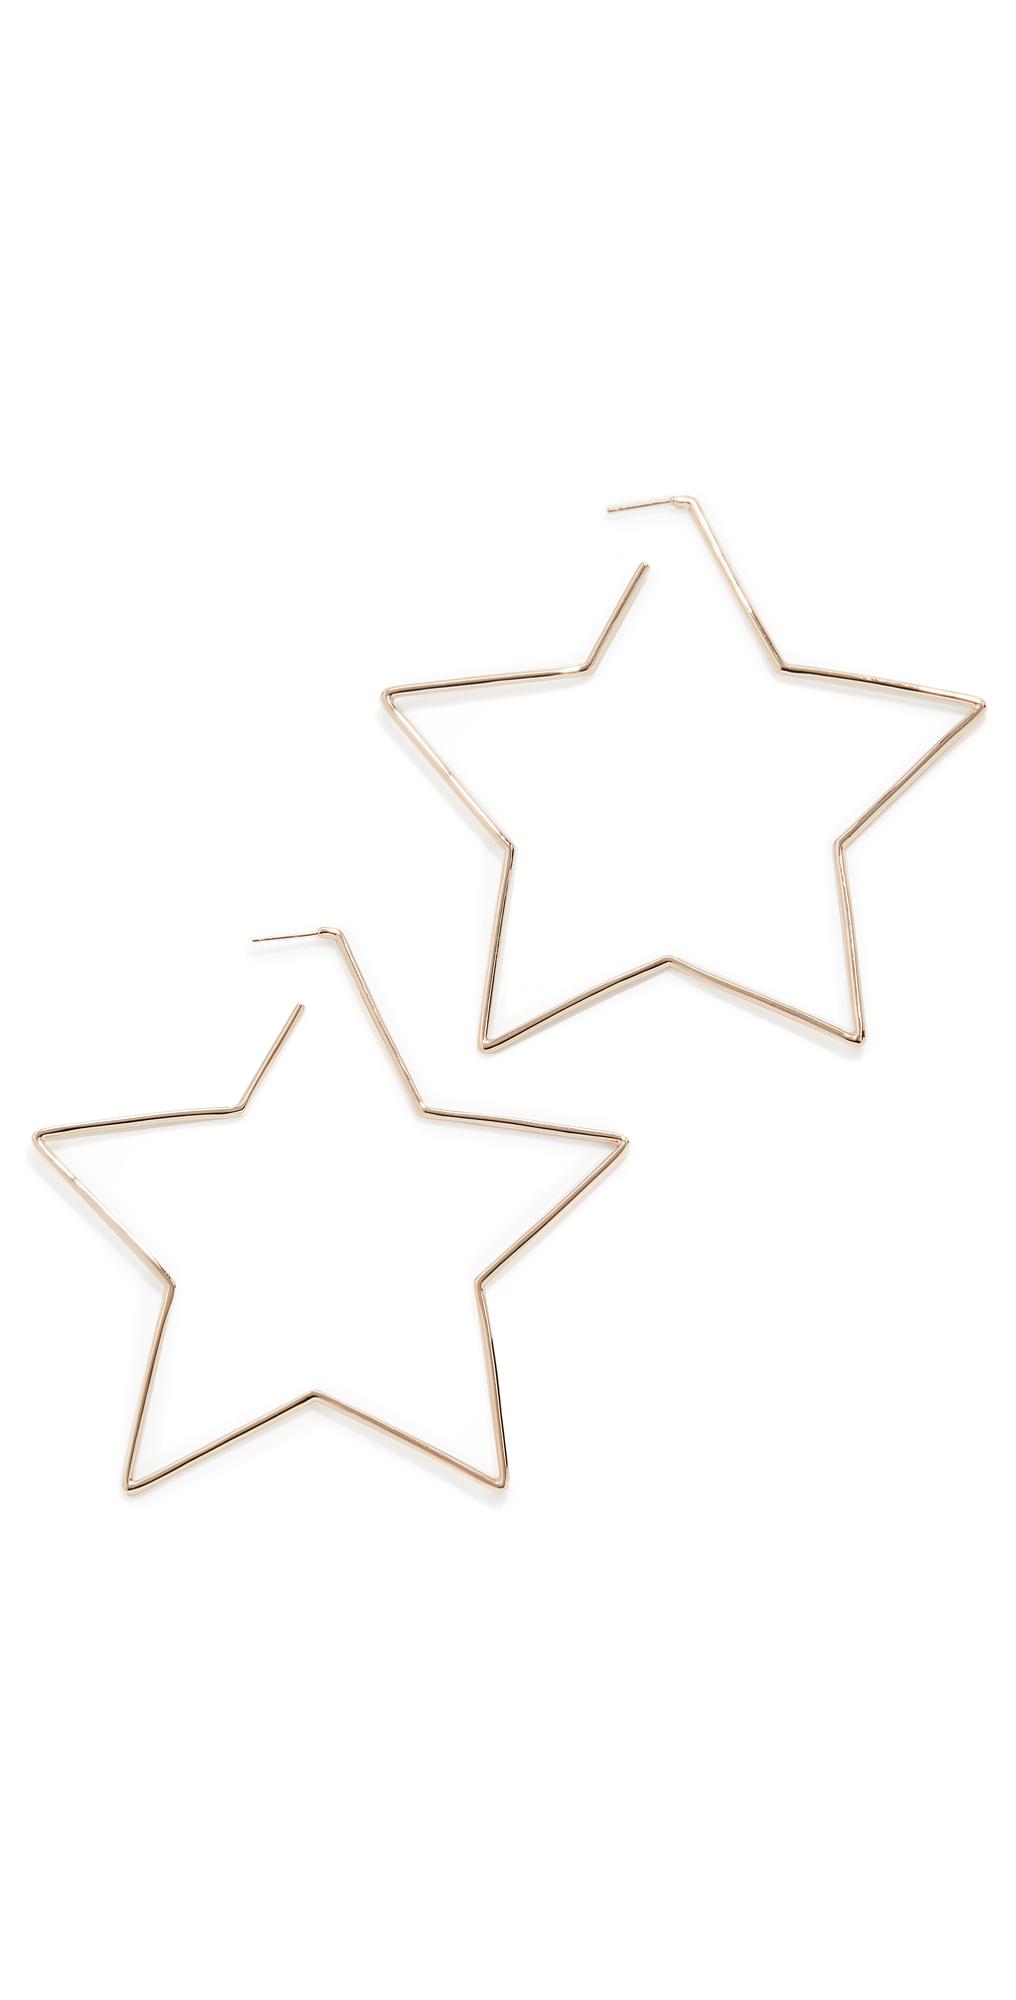 Isabel Marant Shiny In Love Hoop Earrings